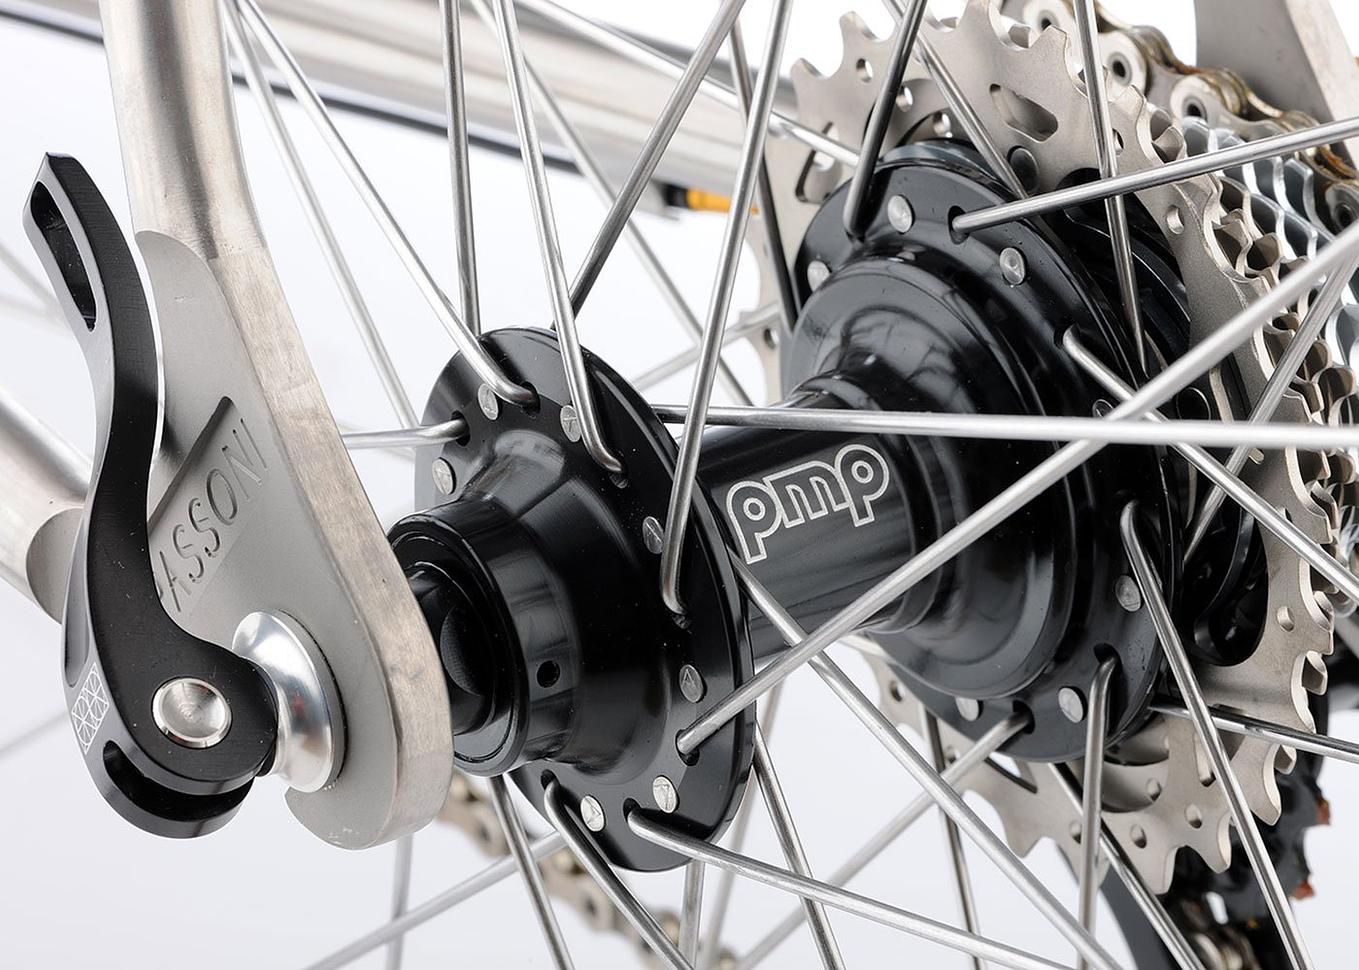 passoni-world-best-titanium-bicycles-italy-8